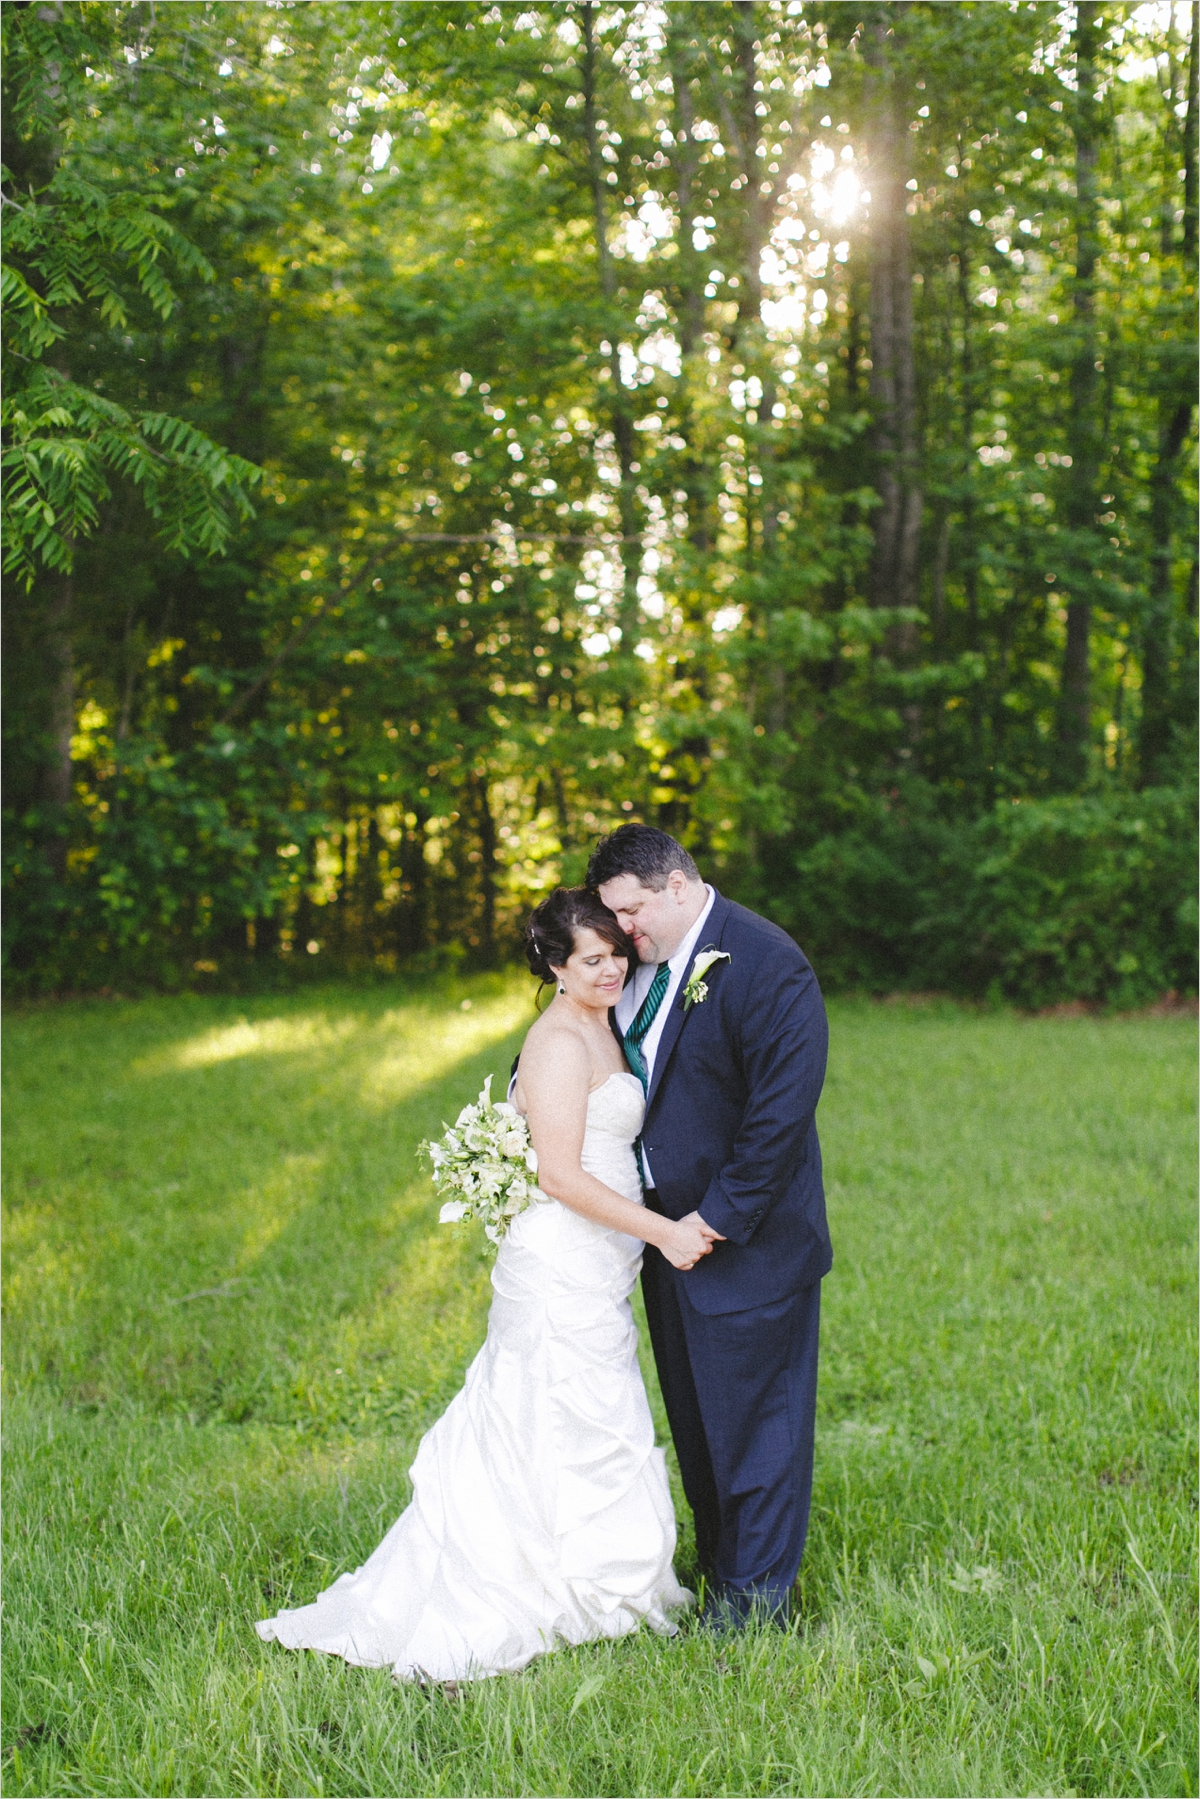 anna-david-historic-blackstone-virginia-wedding_0030